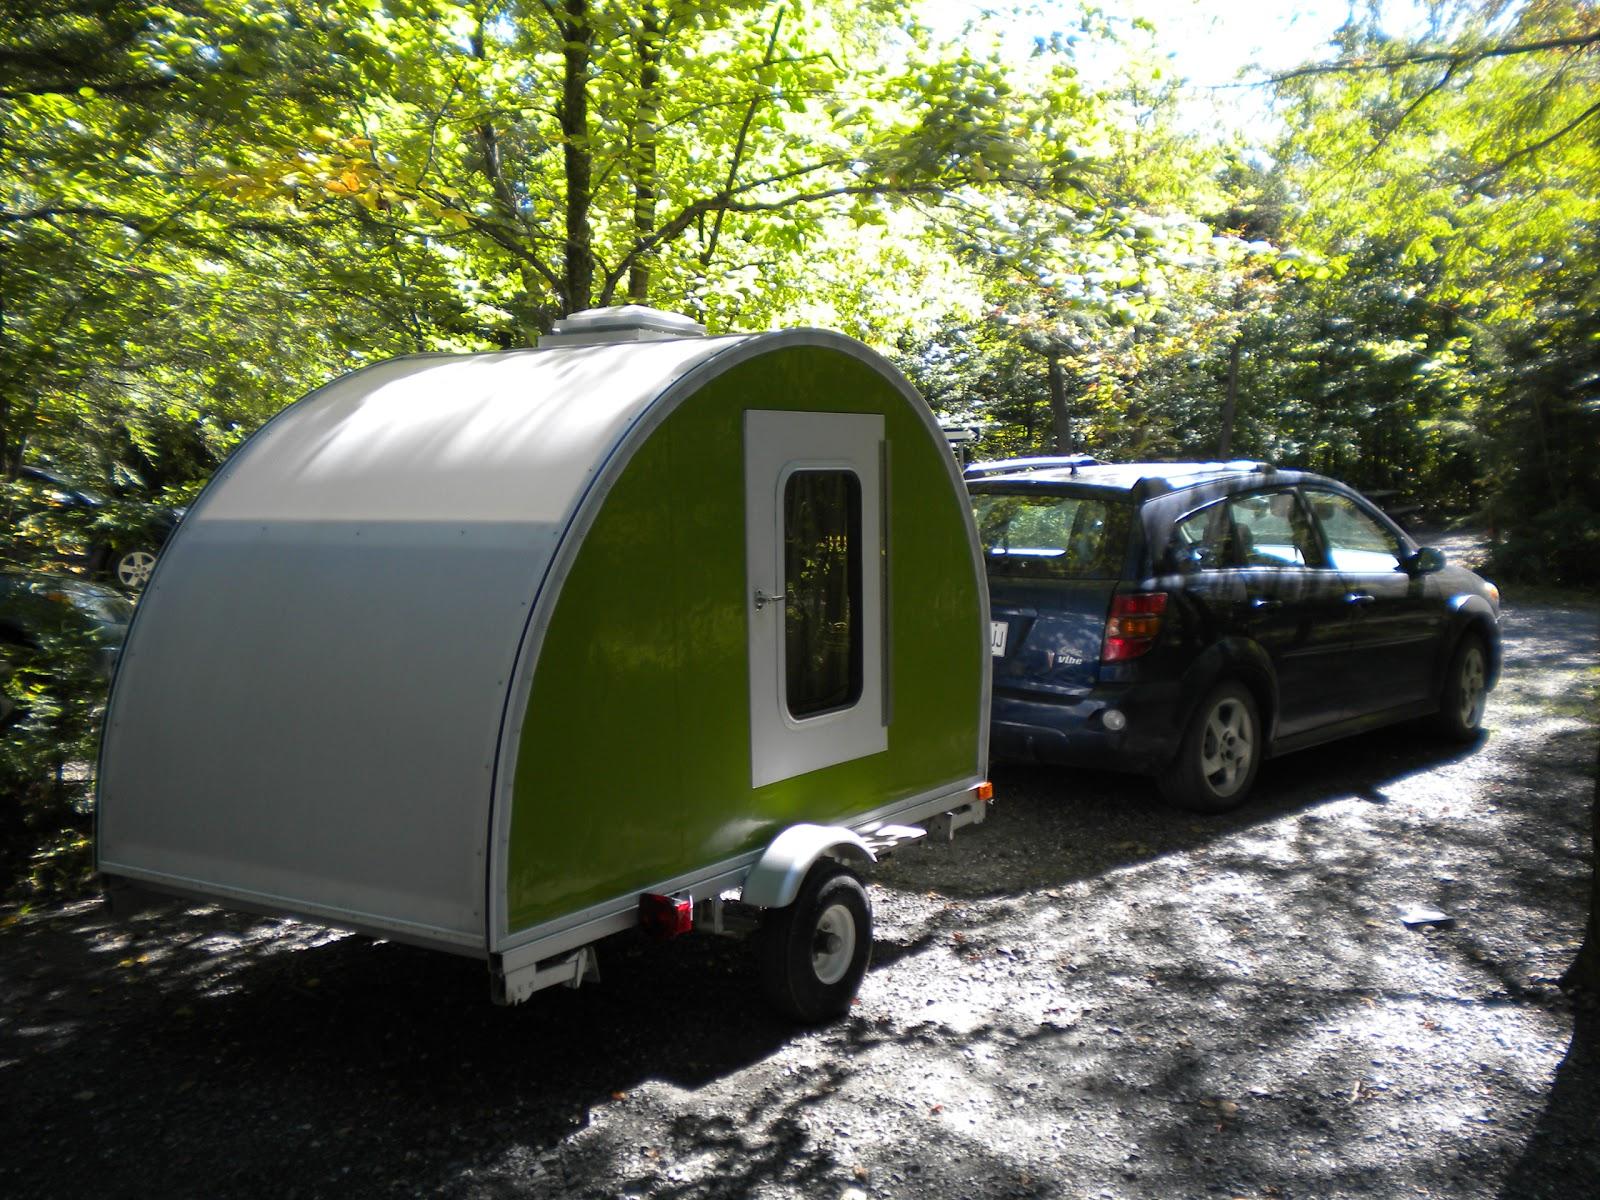 Teardrop Trailer Kit 8 Cubby : Teardroptrailerkit my teardrop trailer